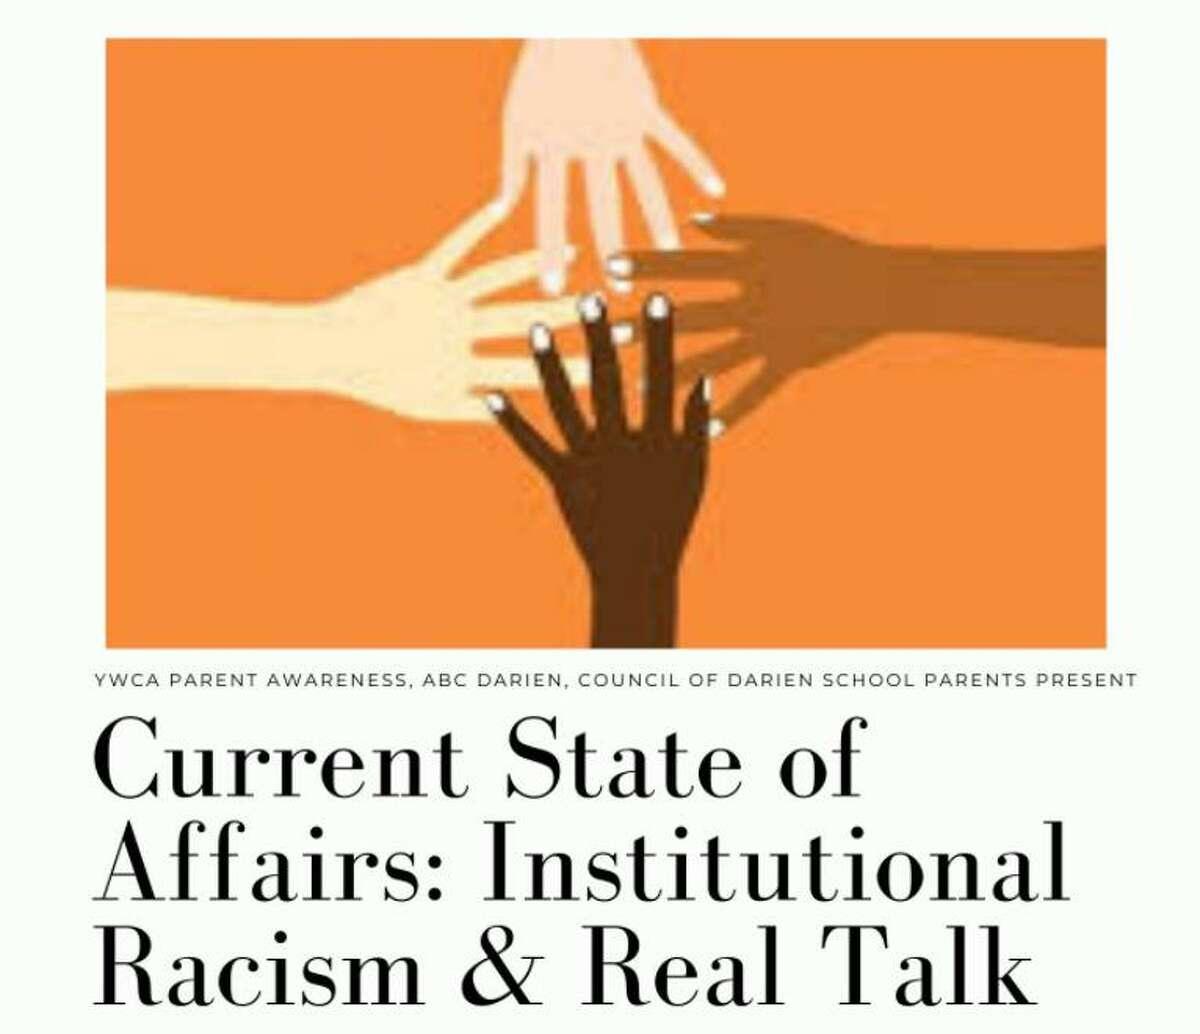 Ywca Abc Darien Darien School Parents Partner To Hold Parent Talk On Racism